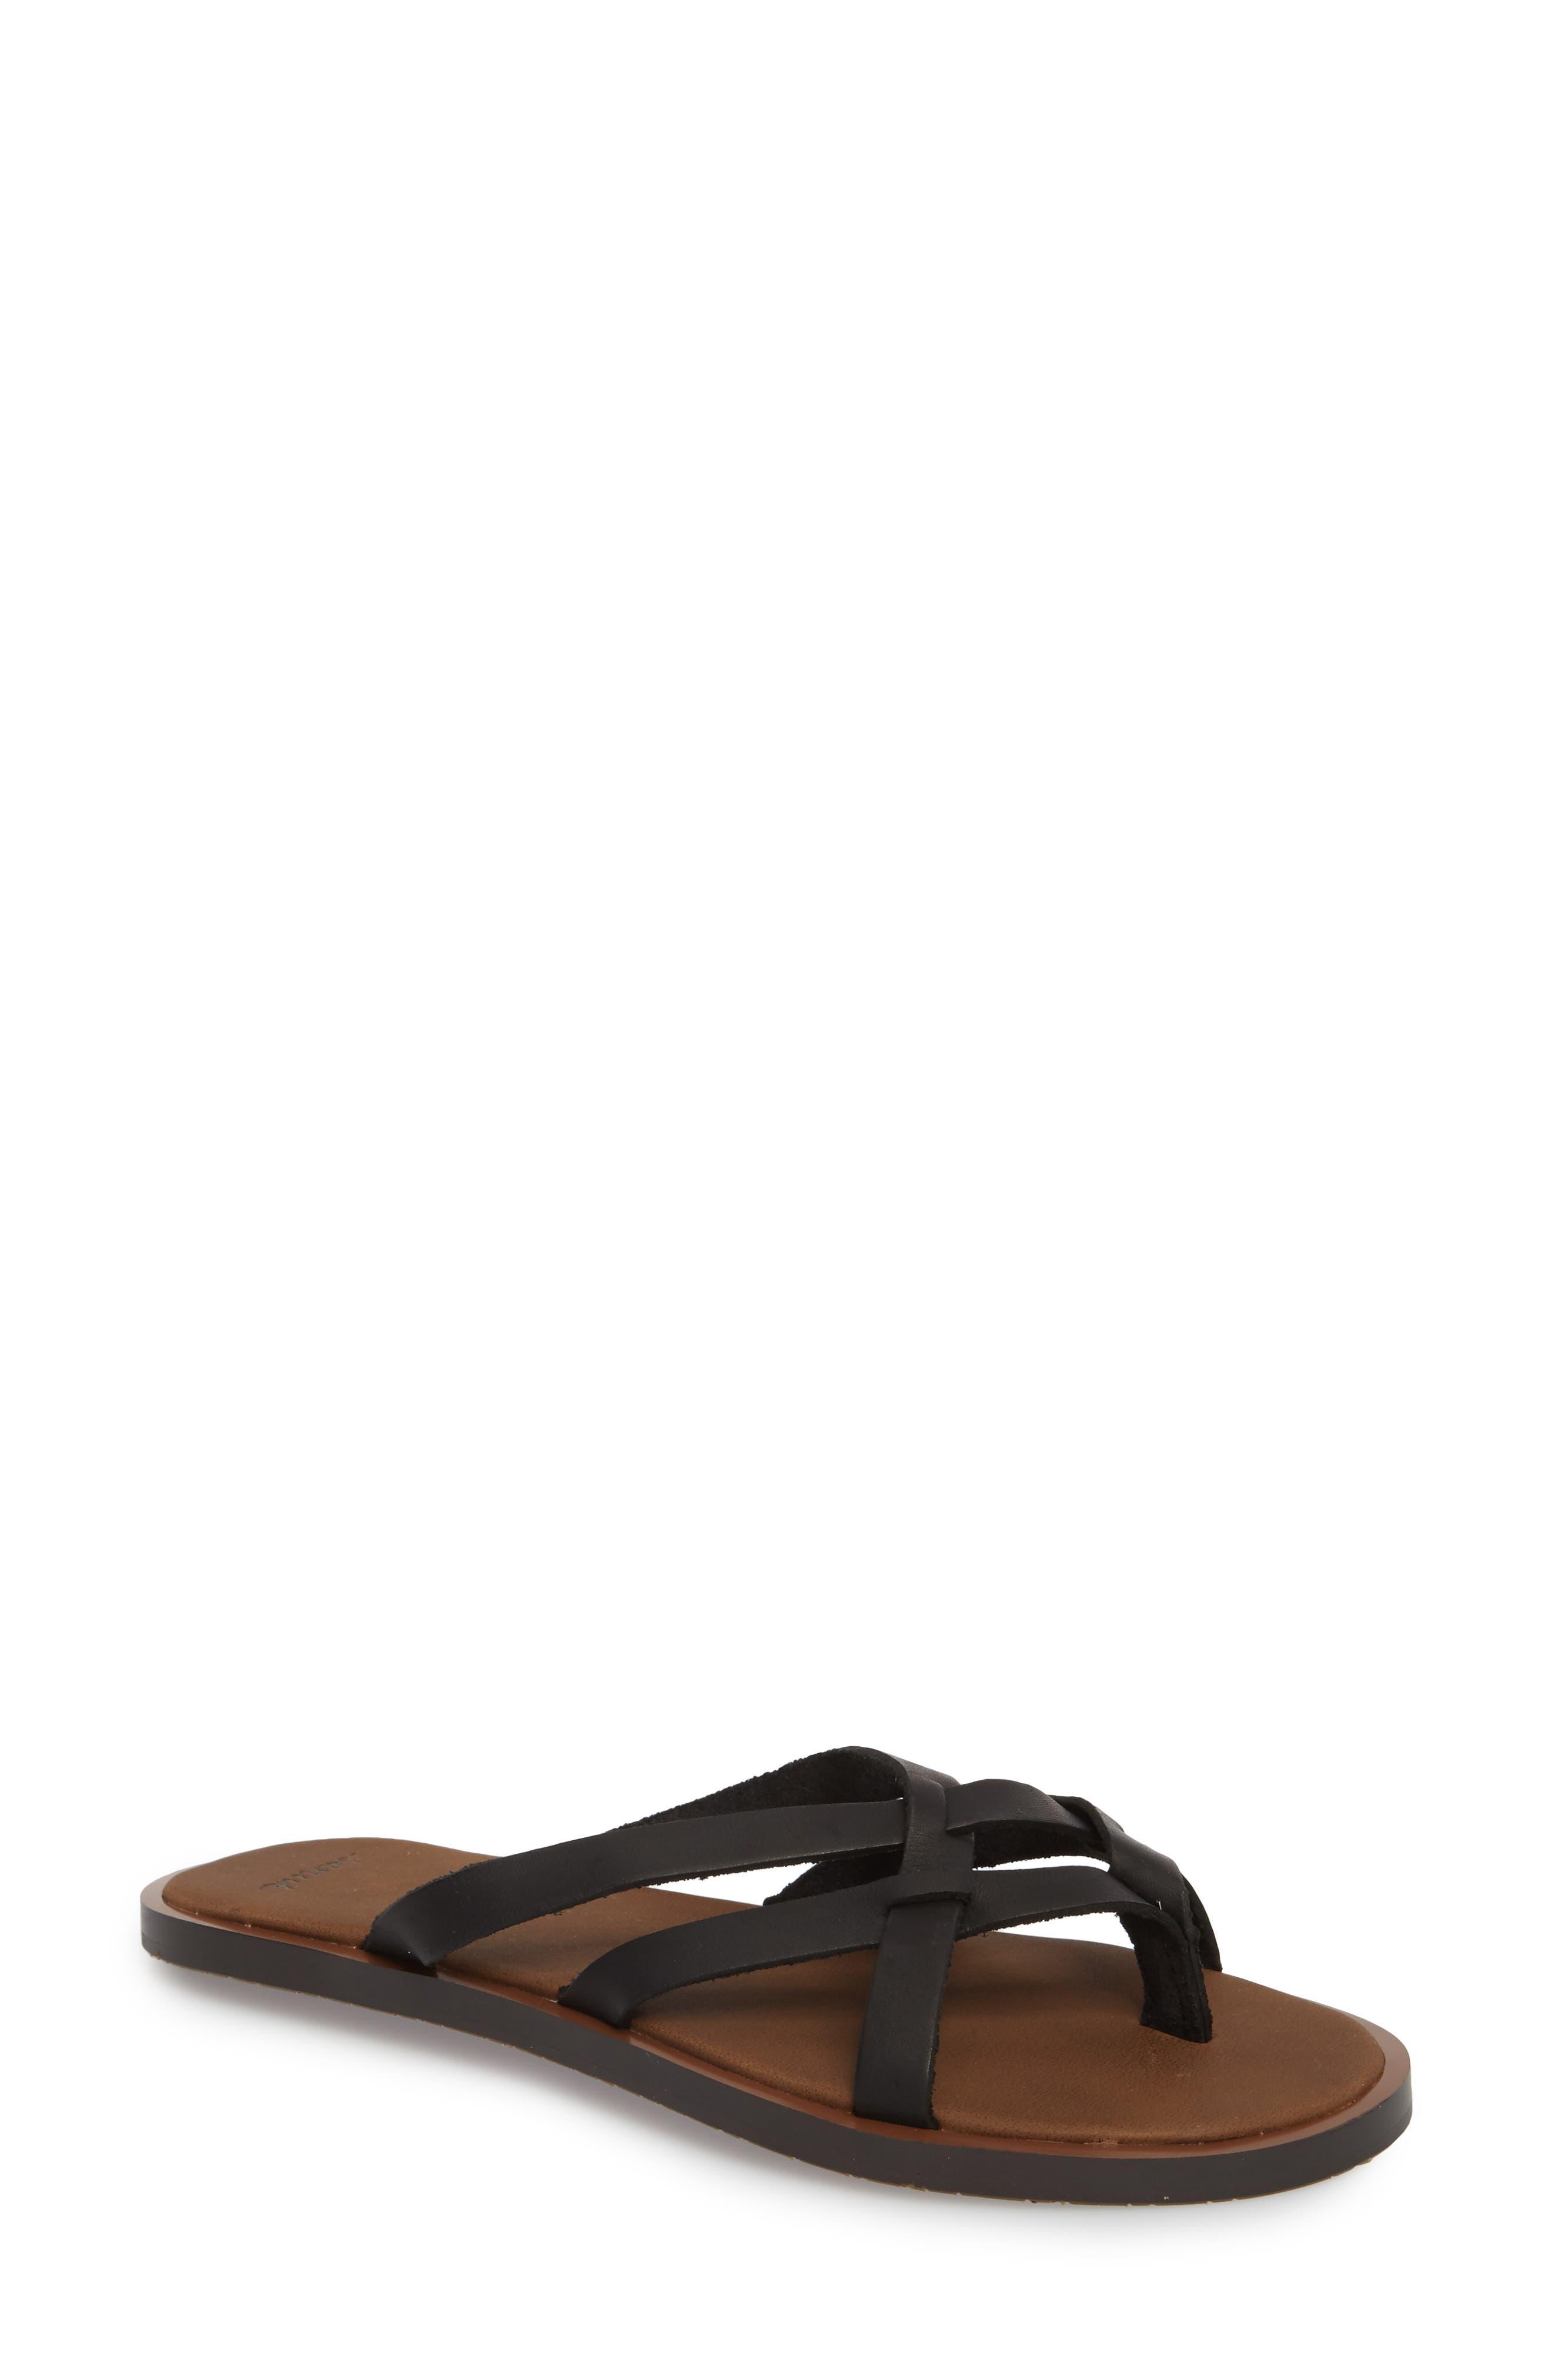 Yoga Strappy Thong Sandal,                         Main,                         color, 001